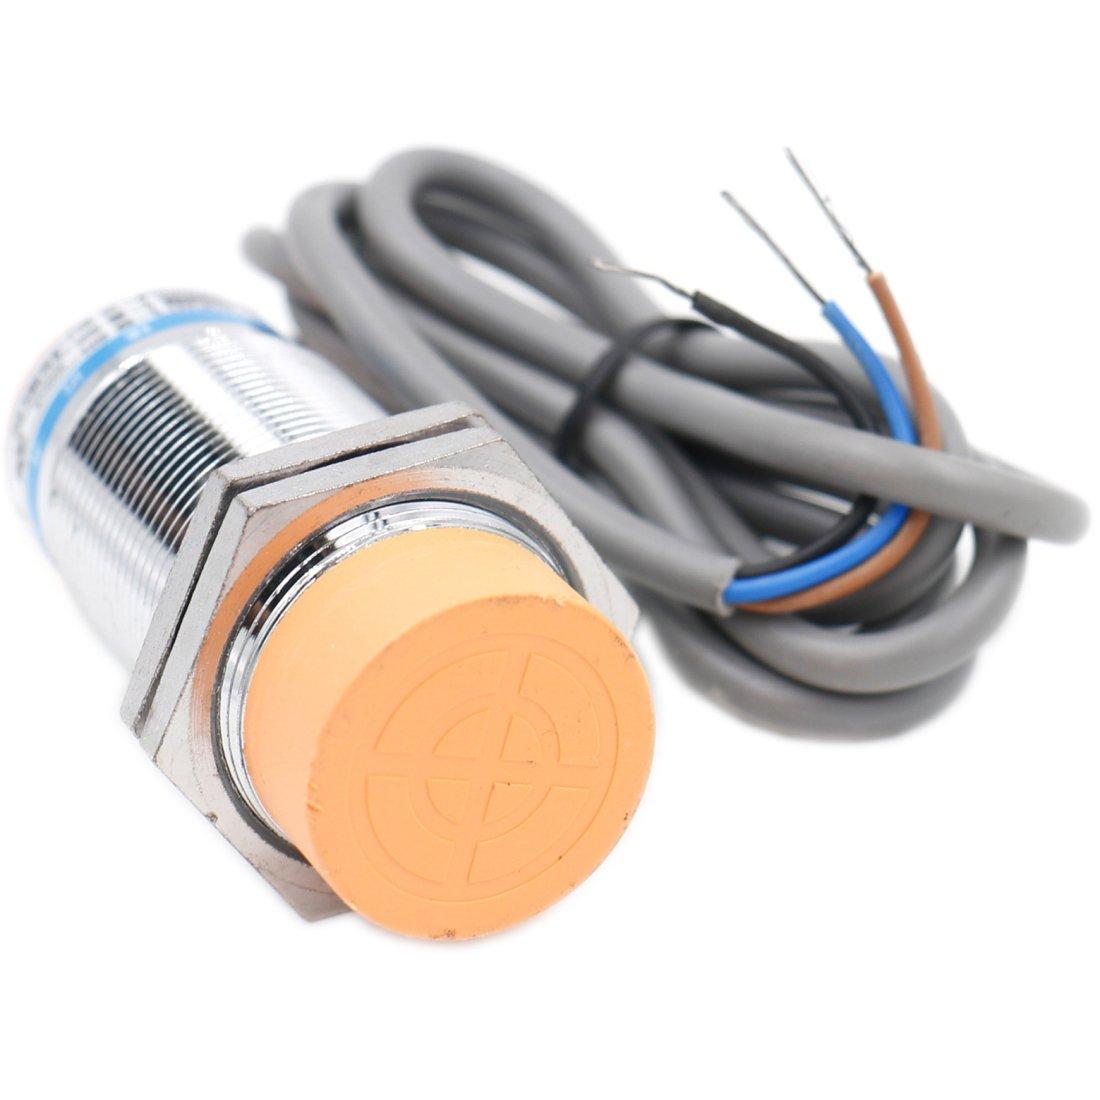 Heschen rivelatore del sensore di prossimità induttivo LJ30A3–15-Z/BX 15mm 6–36VDC 300mA NPN normalmente aperto (no) 3fili Heschen Electric Co.Ltd HS-LJ30A3-15-Z/BX